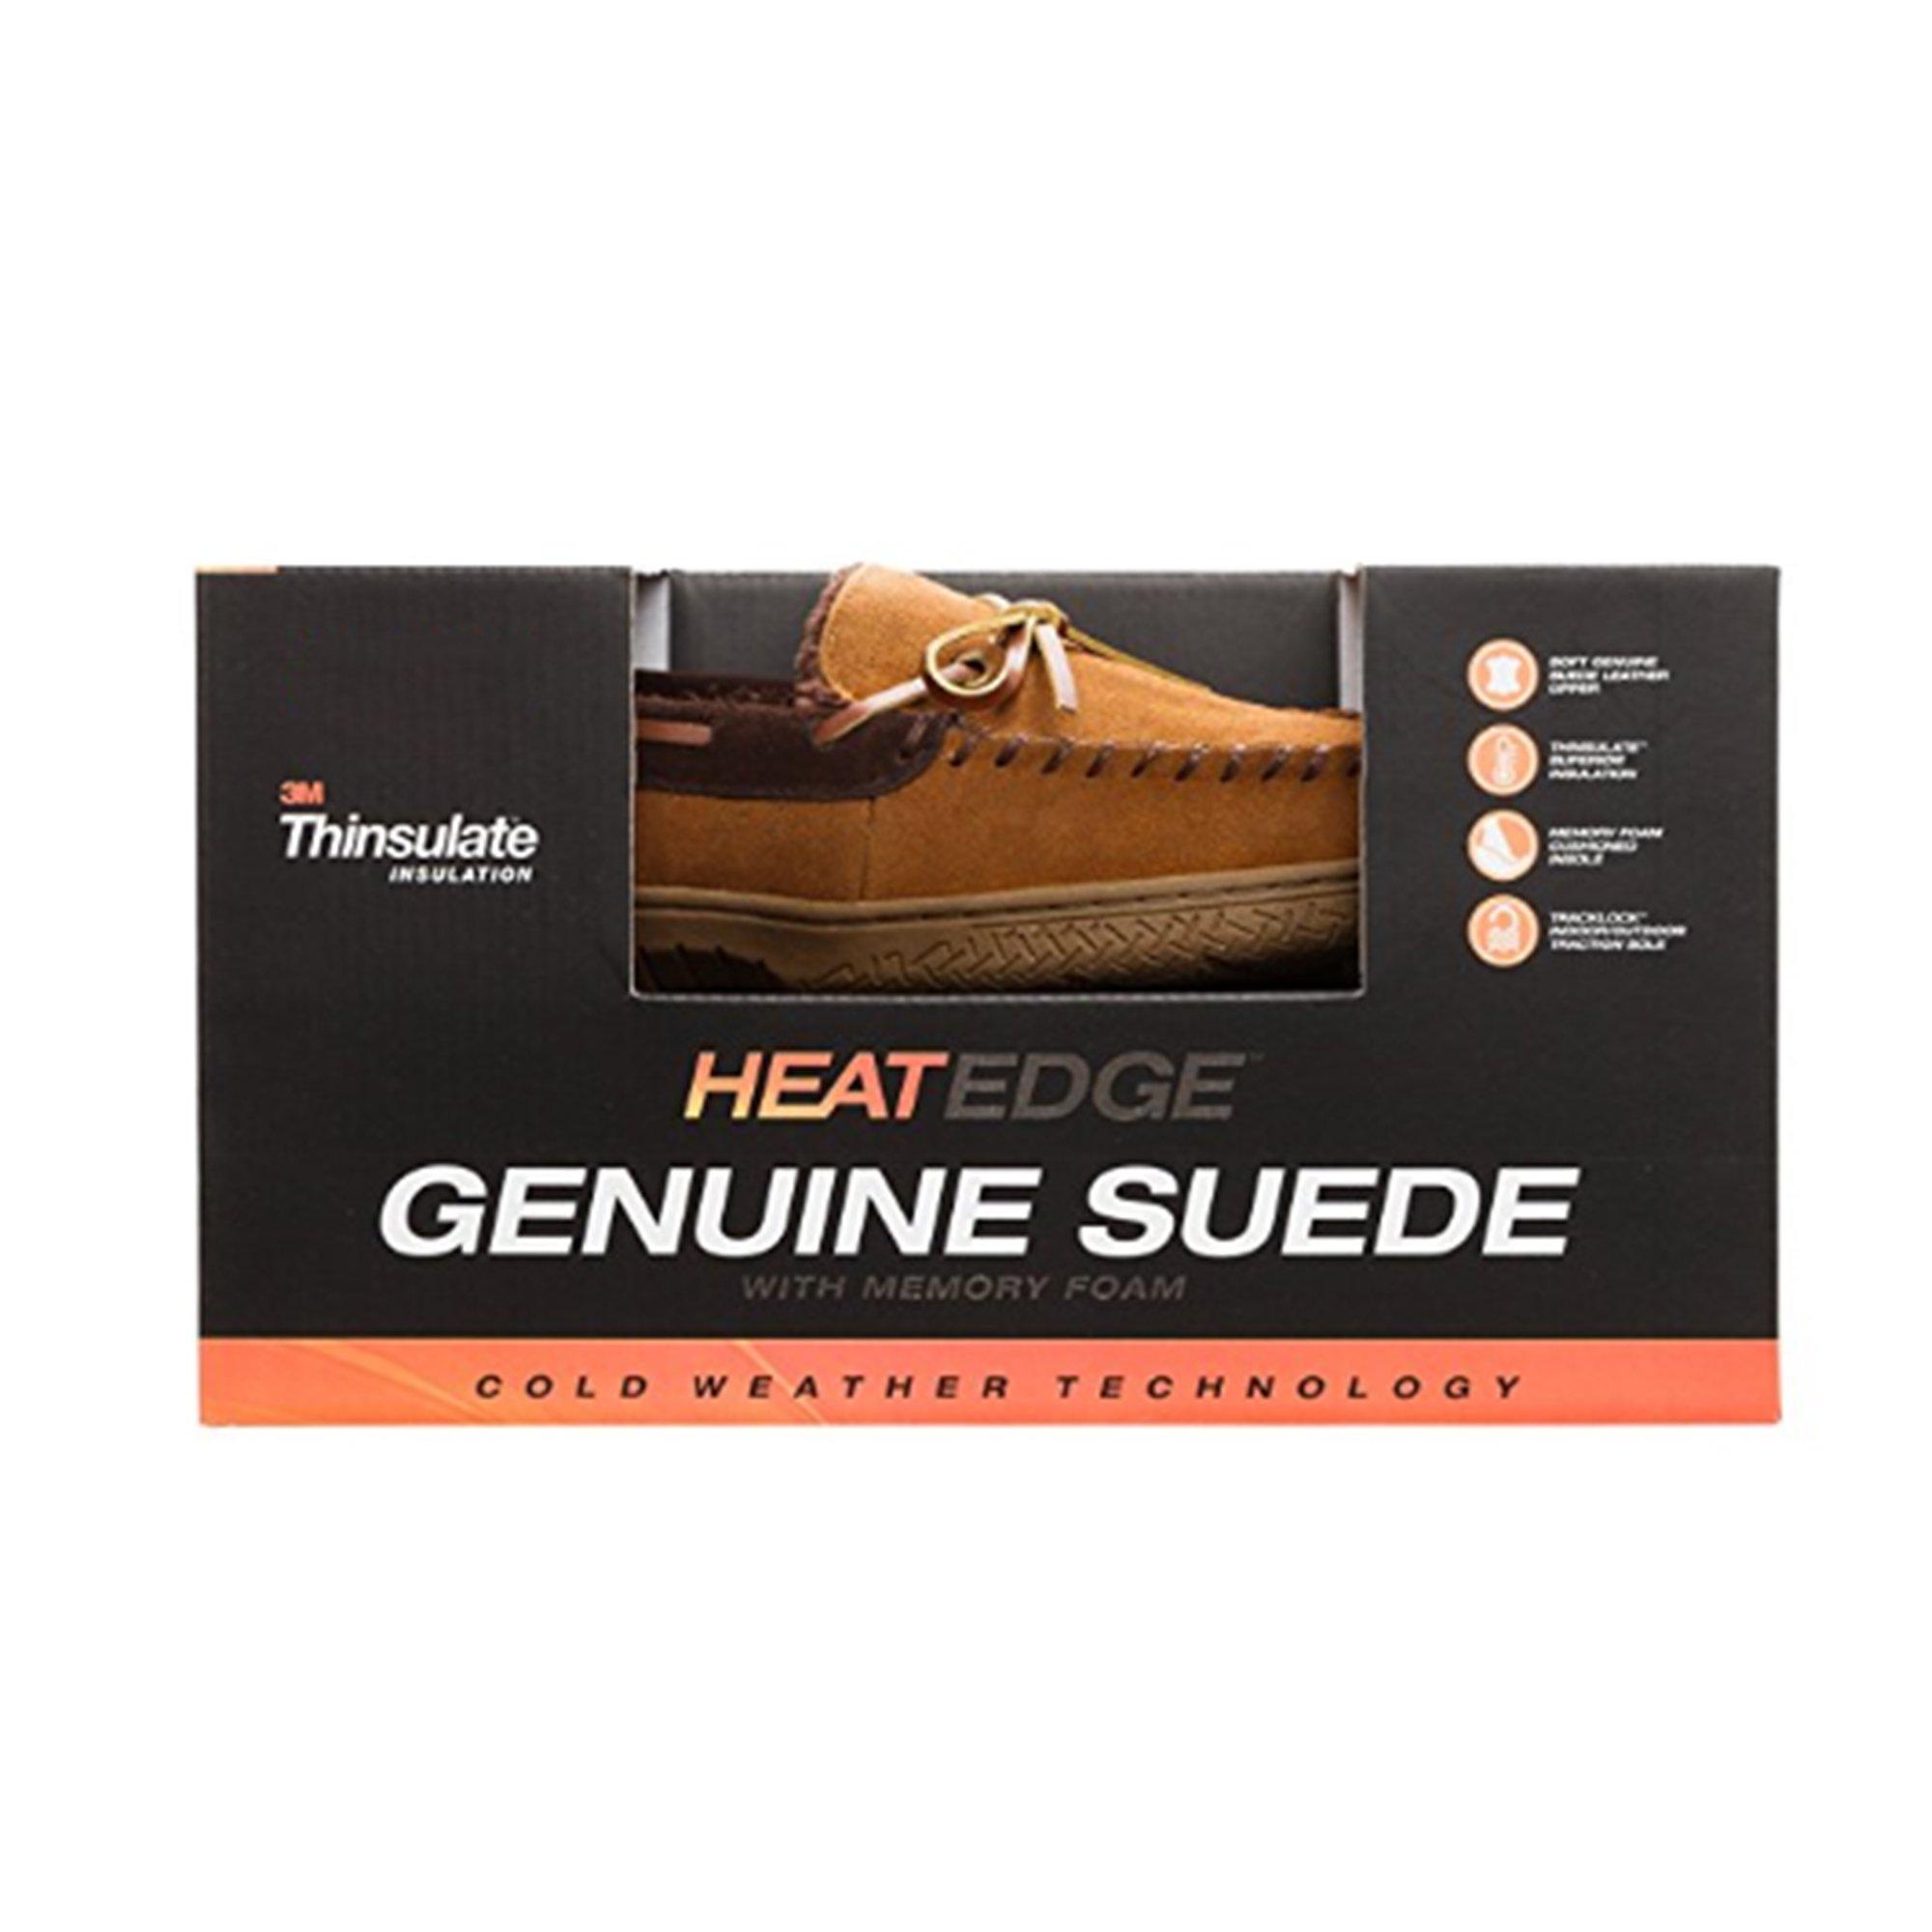 Heat Edge Mens Memory Foam Suede Slip on Indoor/Outdoor Moccasin Slipper Shoe (11, Tan) by Heat Edge (Image #6)